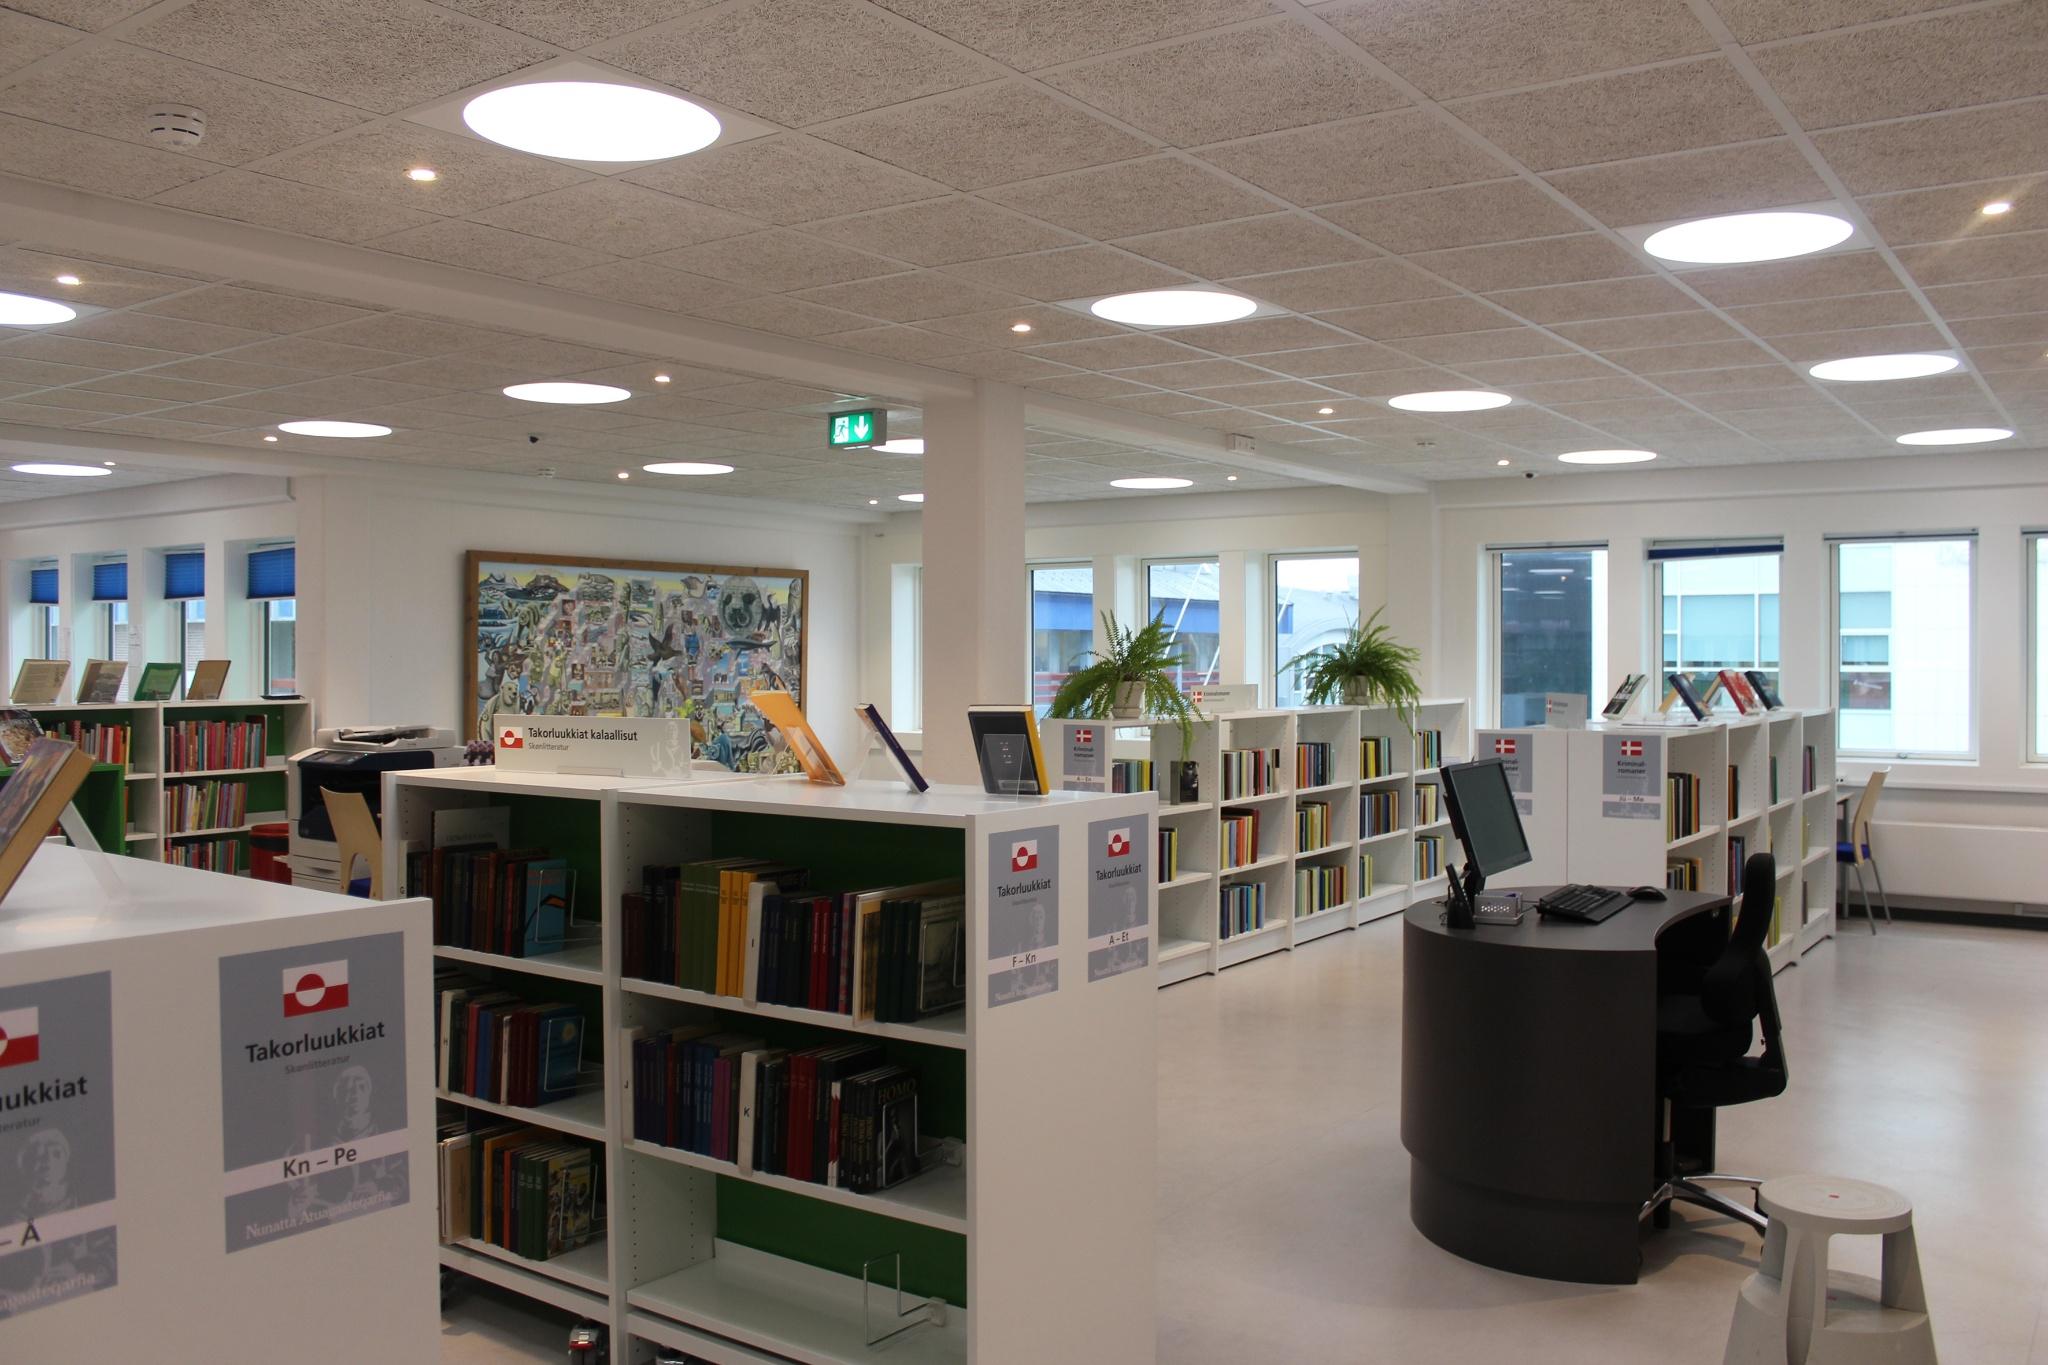 Designportræt_Lisa Dam Trapp_Grønlands bibliotek